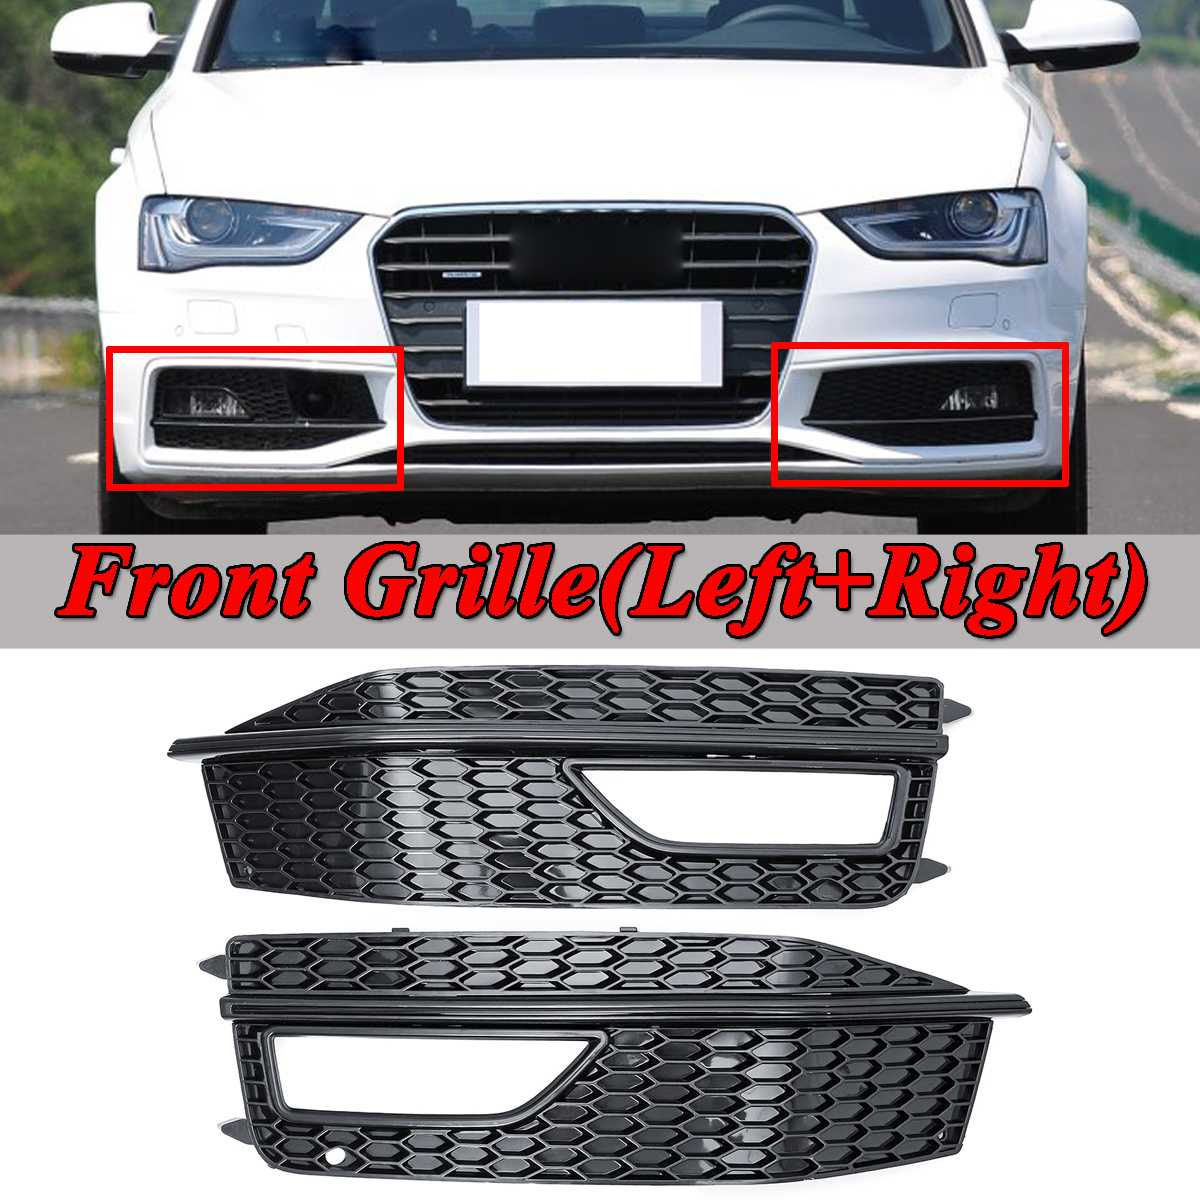 AUDI A4 B8 SEDAN 2009-2011 Rear Bumper Cover with holes for parking sensors